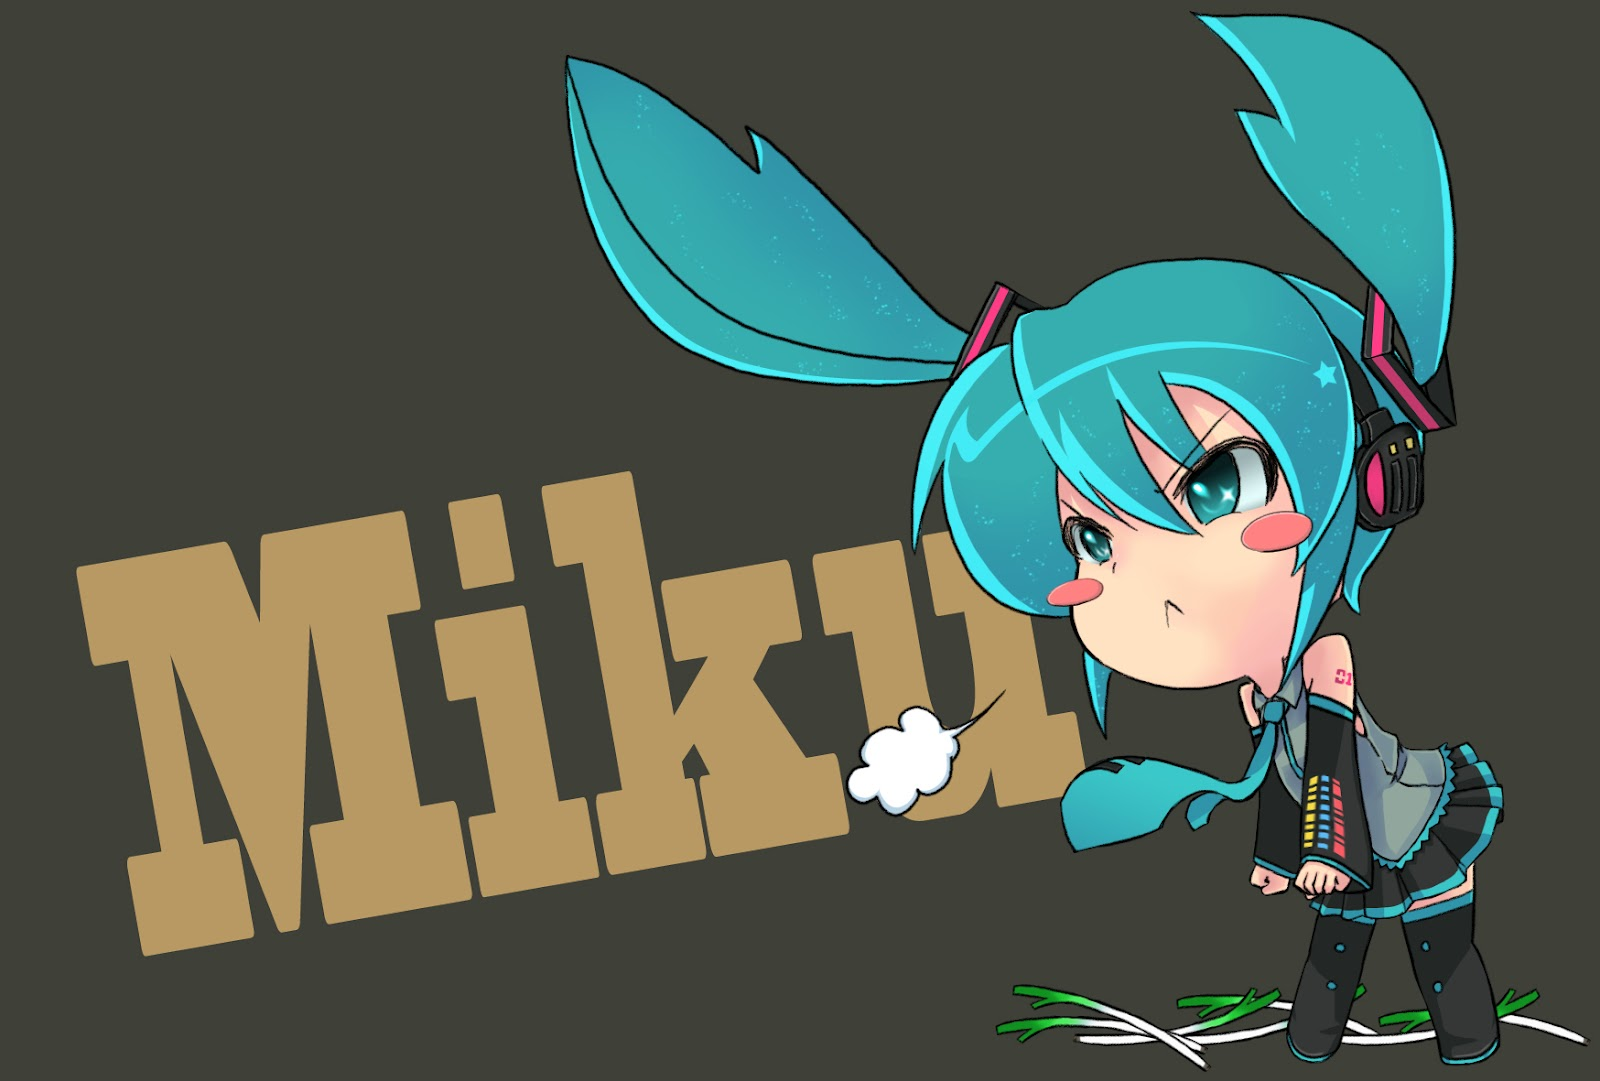 Hatsune Miku Chibi Wallpaper - WallpaperSafari Hatsune Miku Chibi Wallpaper